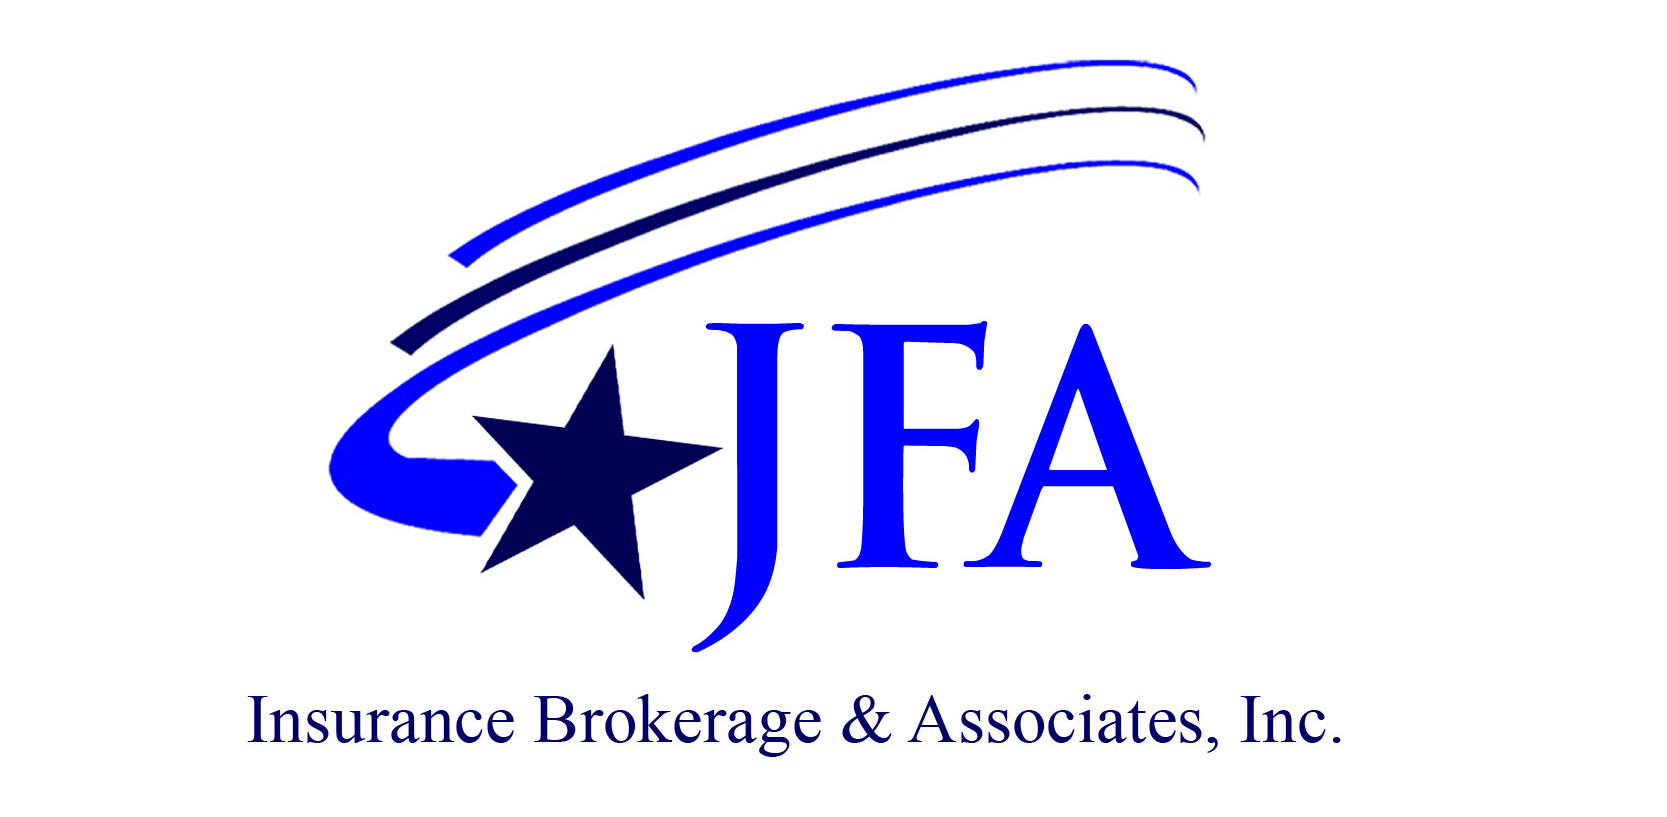 jfa logo large jpg (5)2